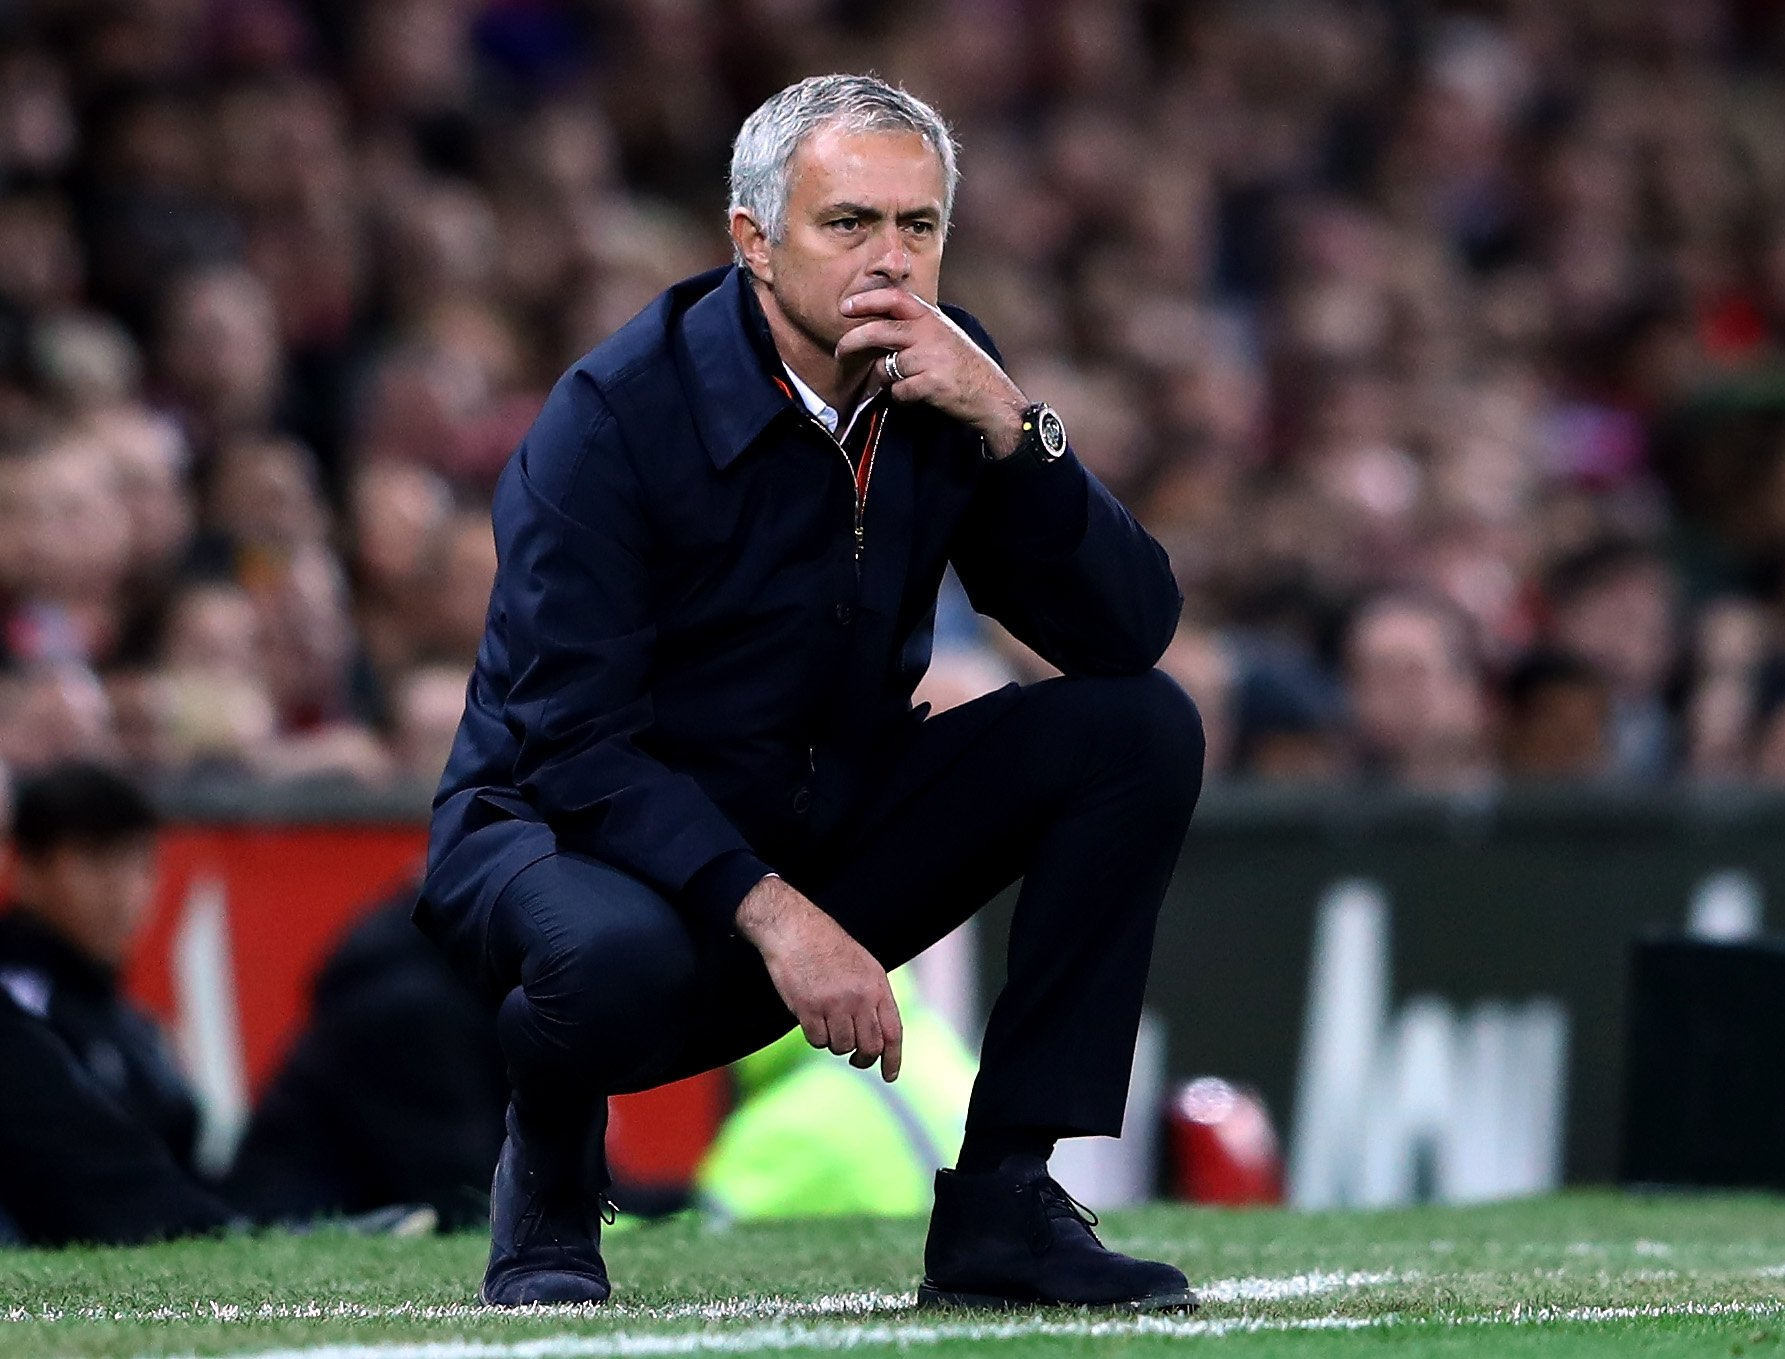 Манчестер Юнайтед – Челси. Прогноз матча чемпионата Англии